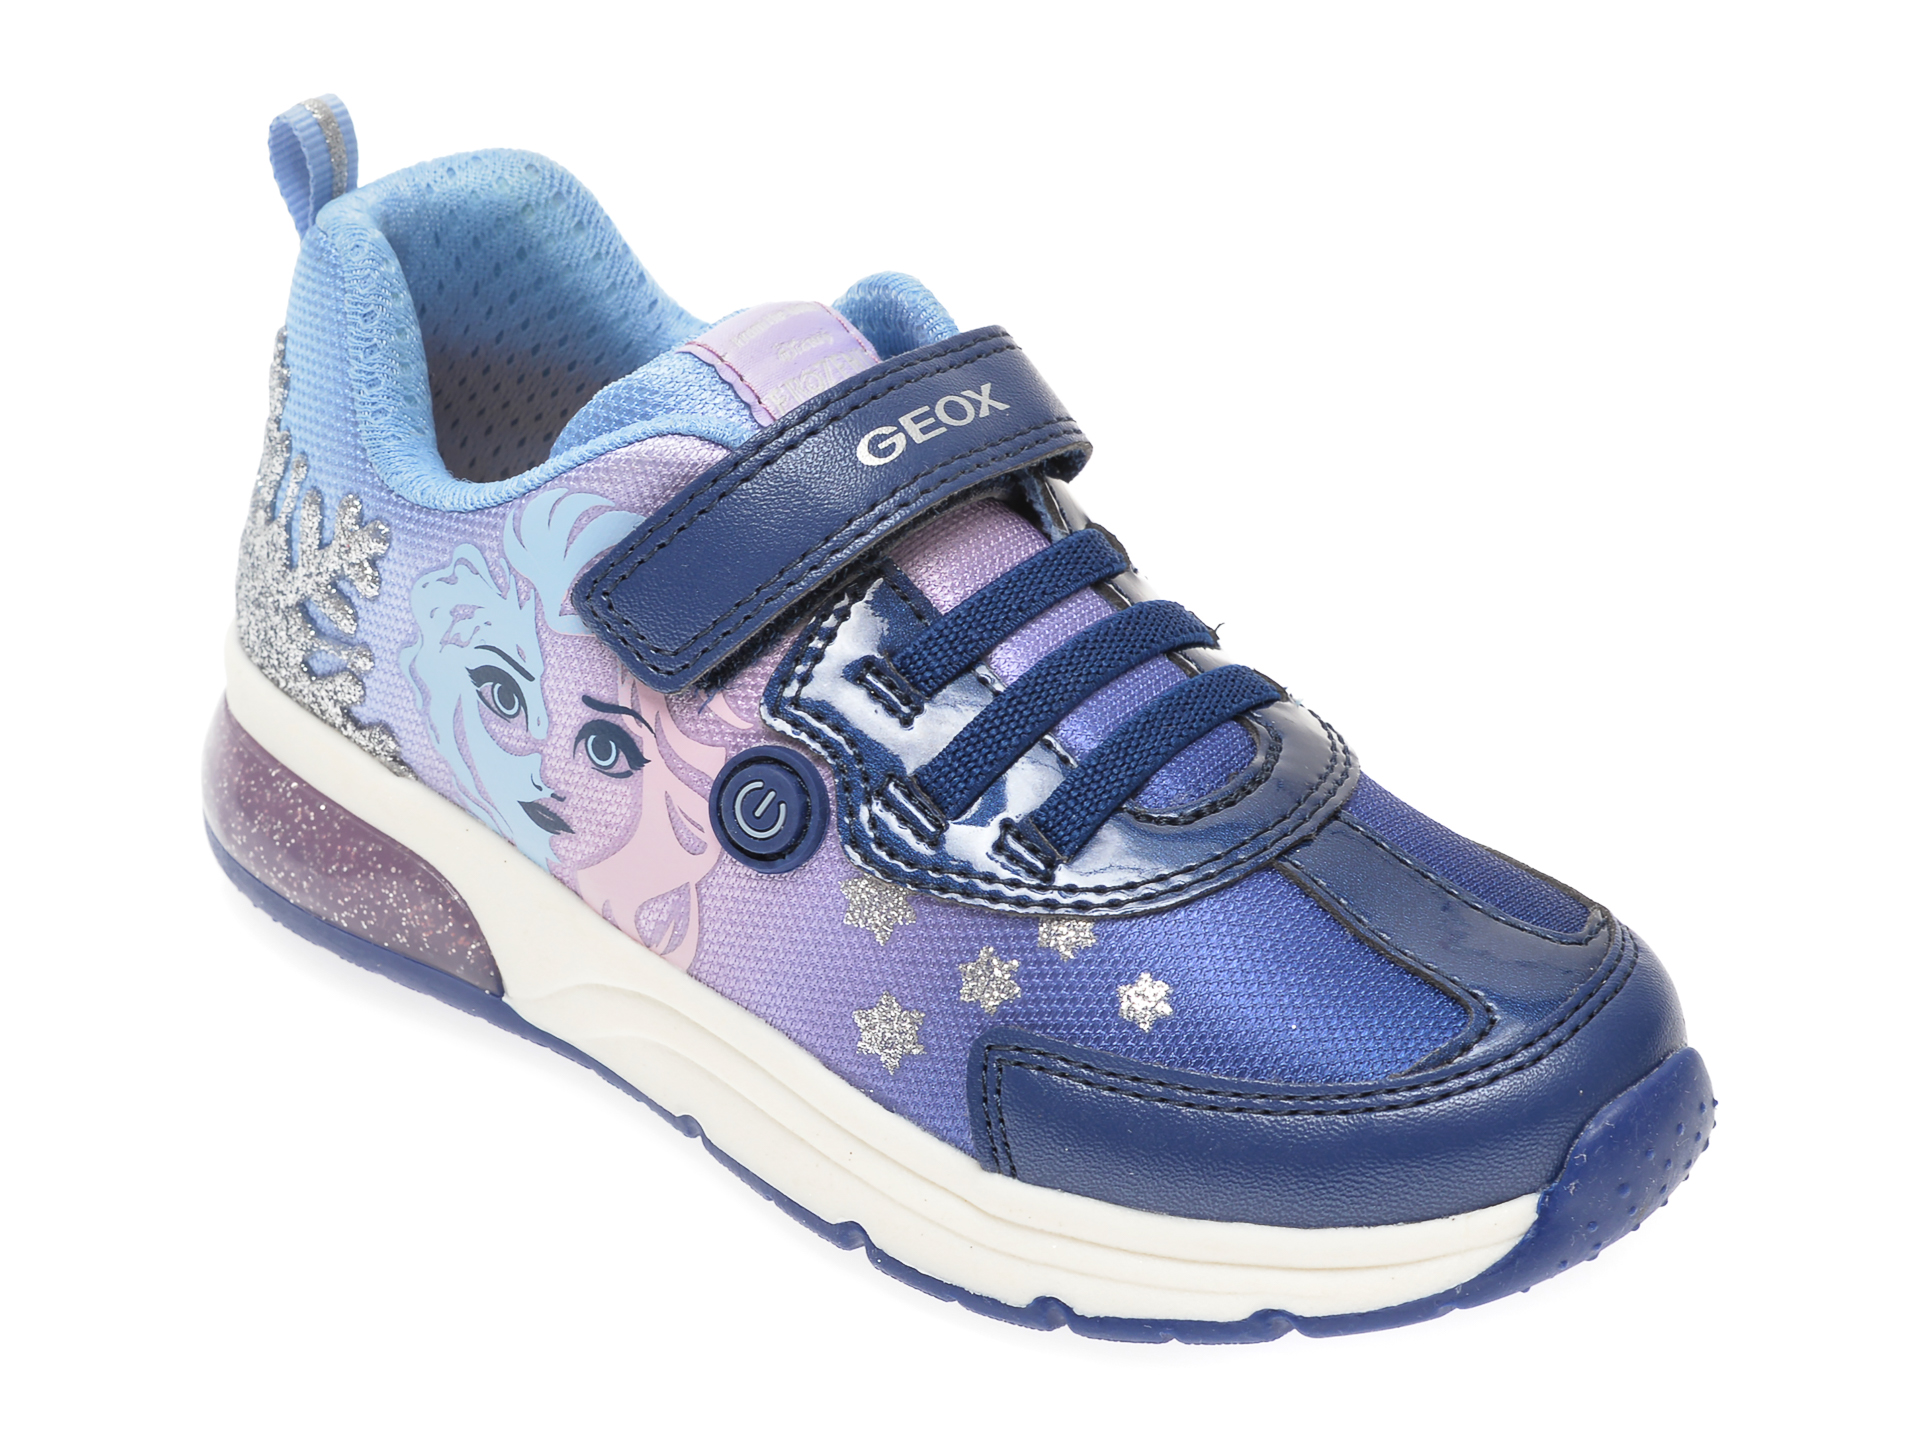 Pantofi sport GEOX bleumarin, J028VD, din material textil si piele ecologica New